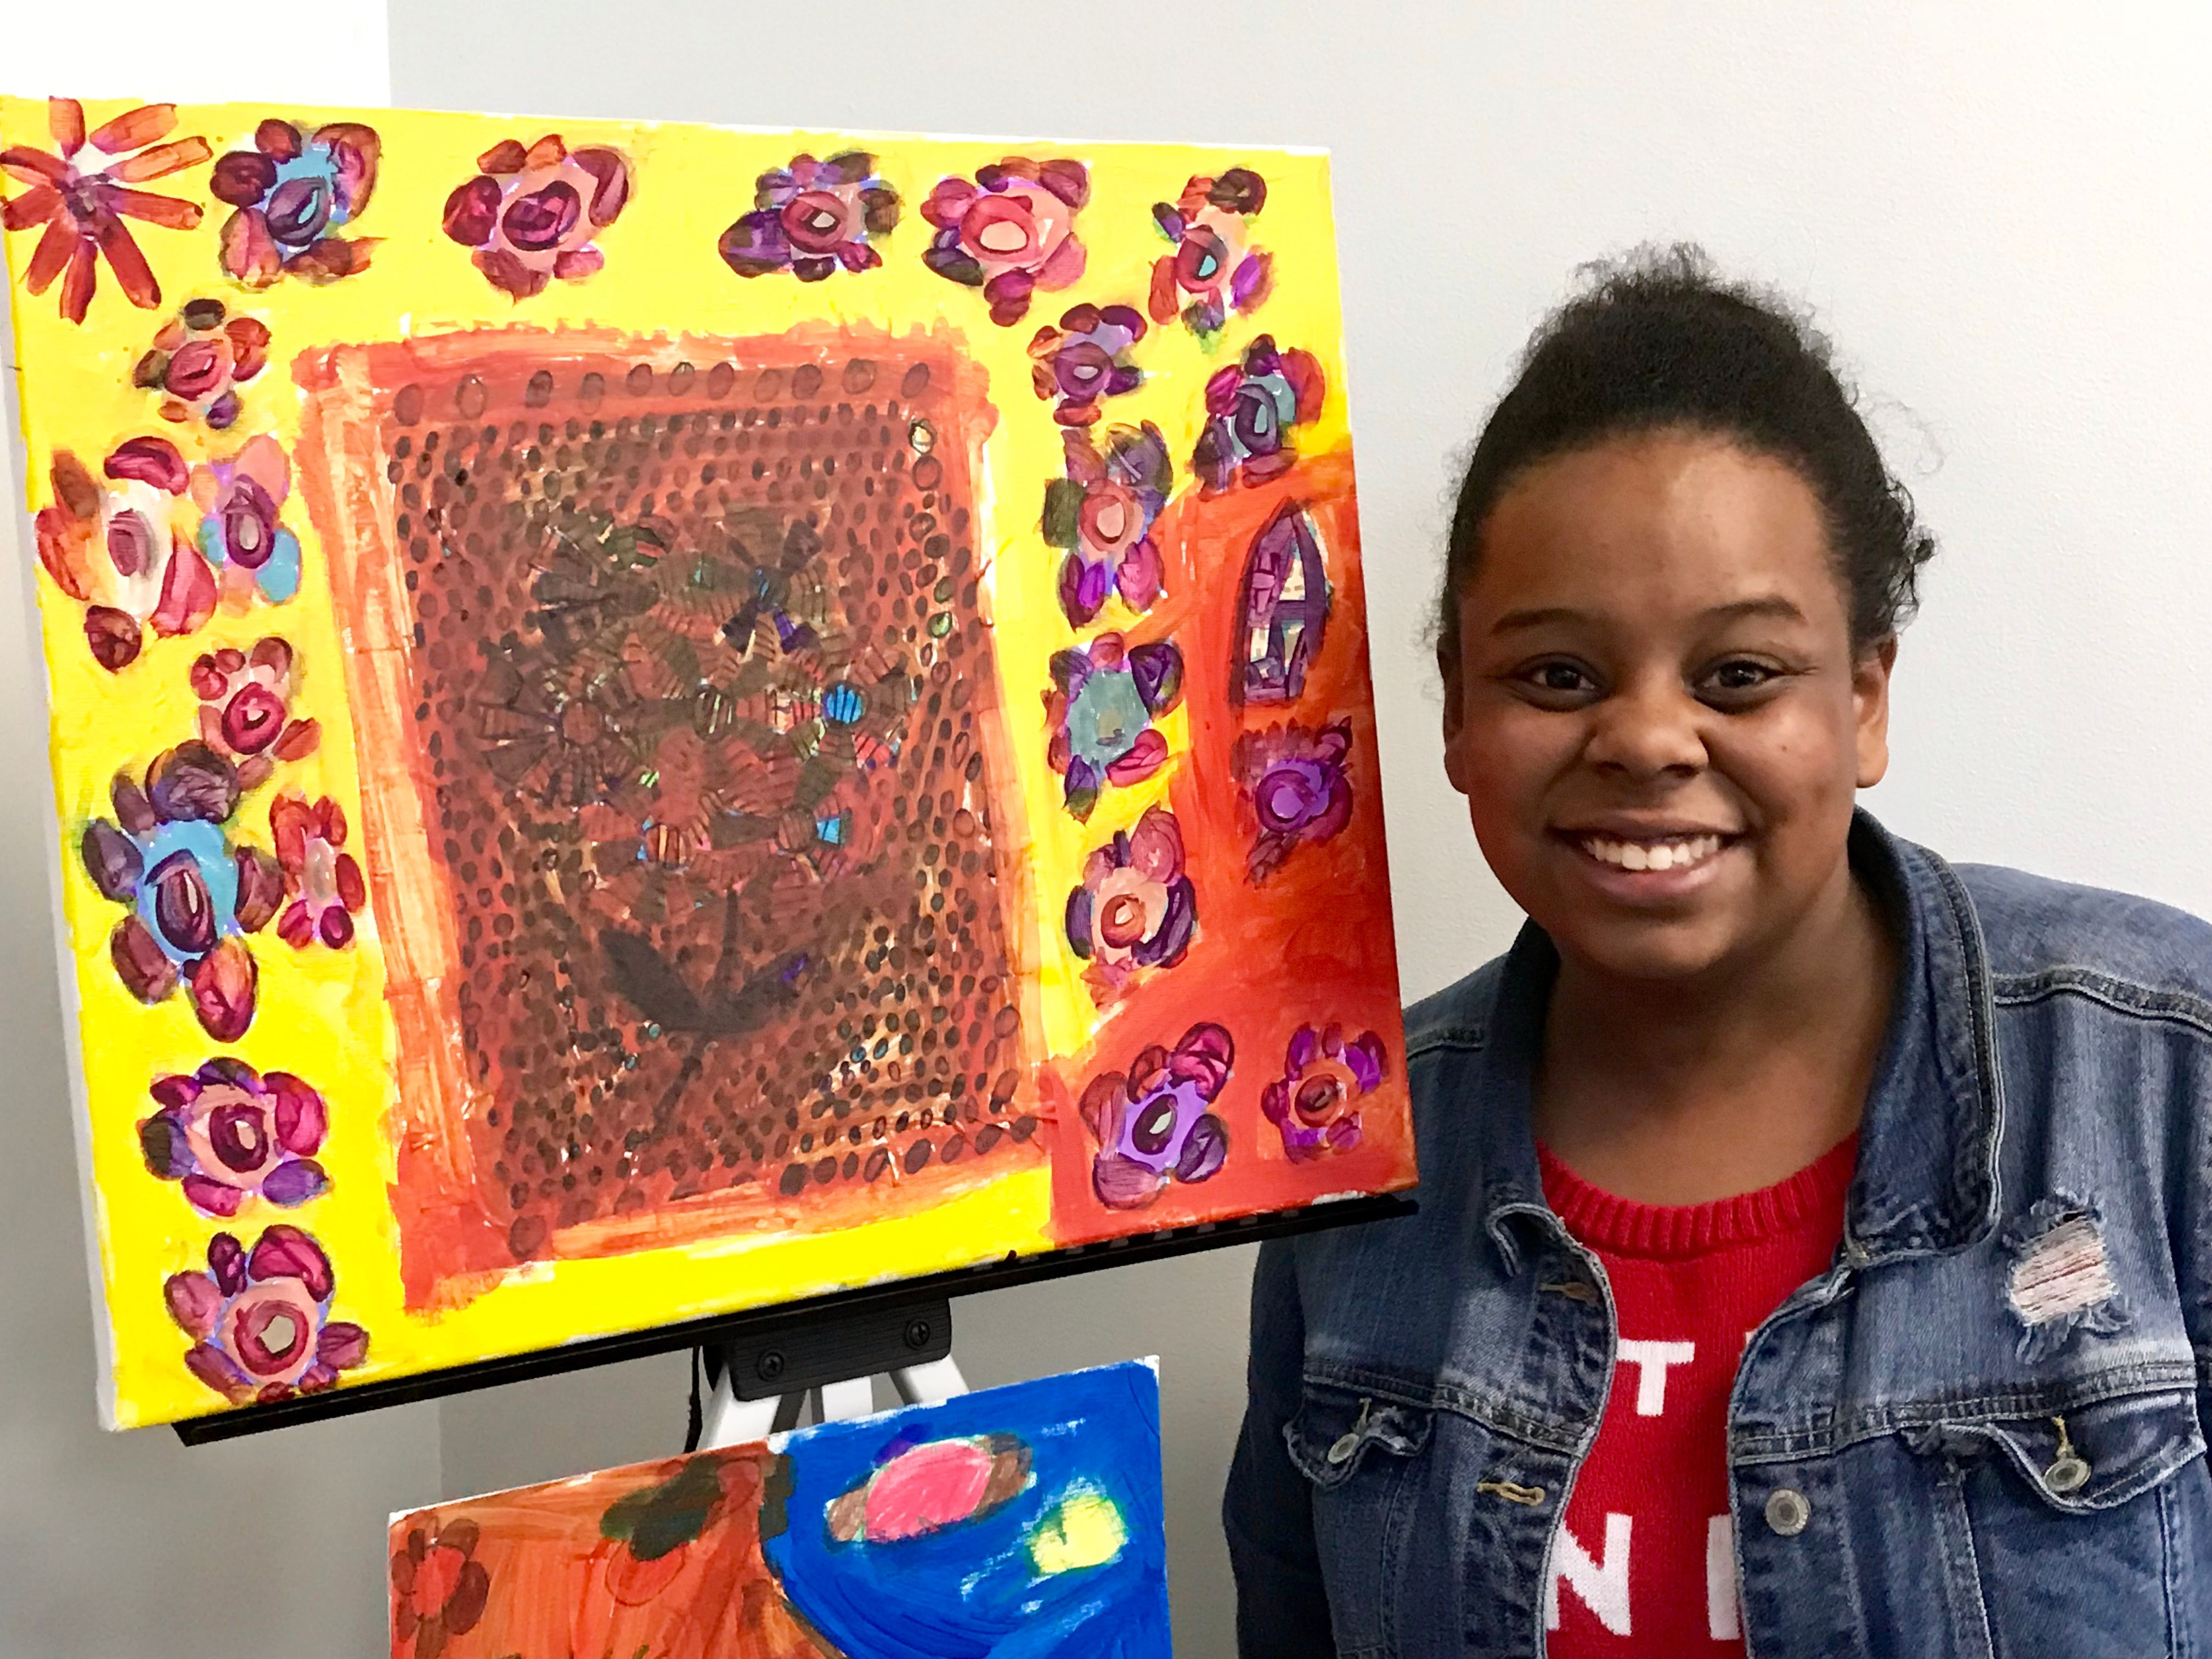 Cassie stands next to her original artwork on display during an exhibit